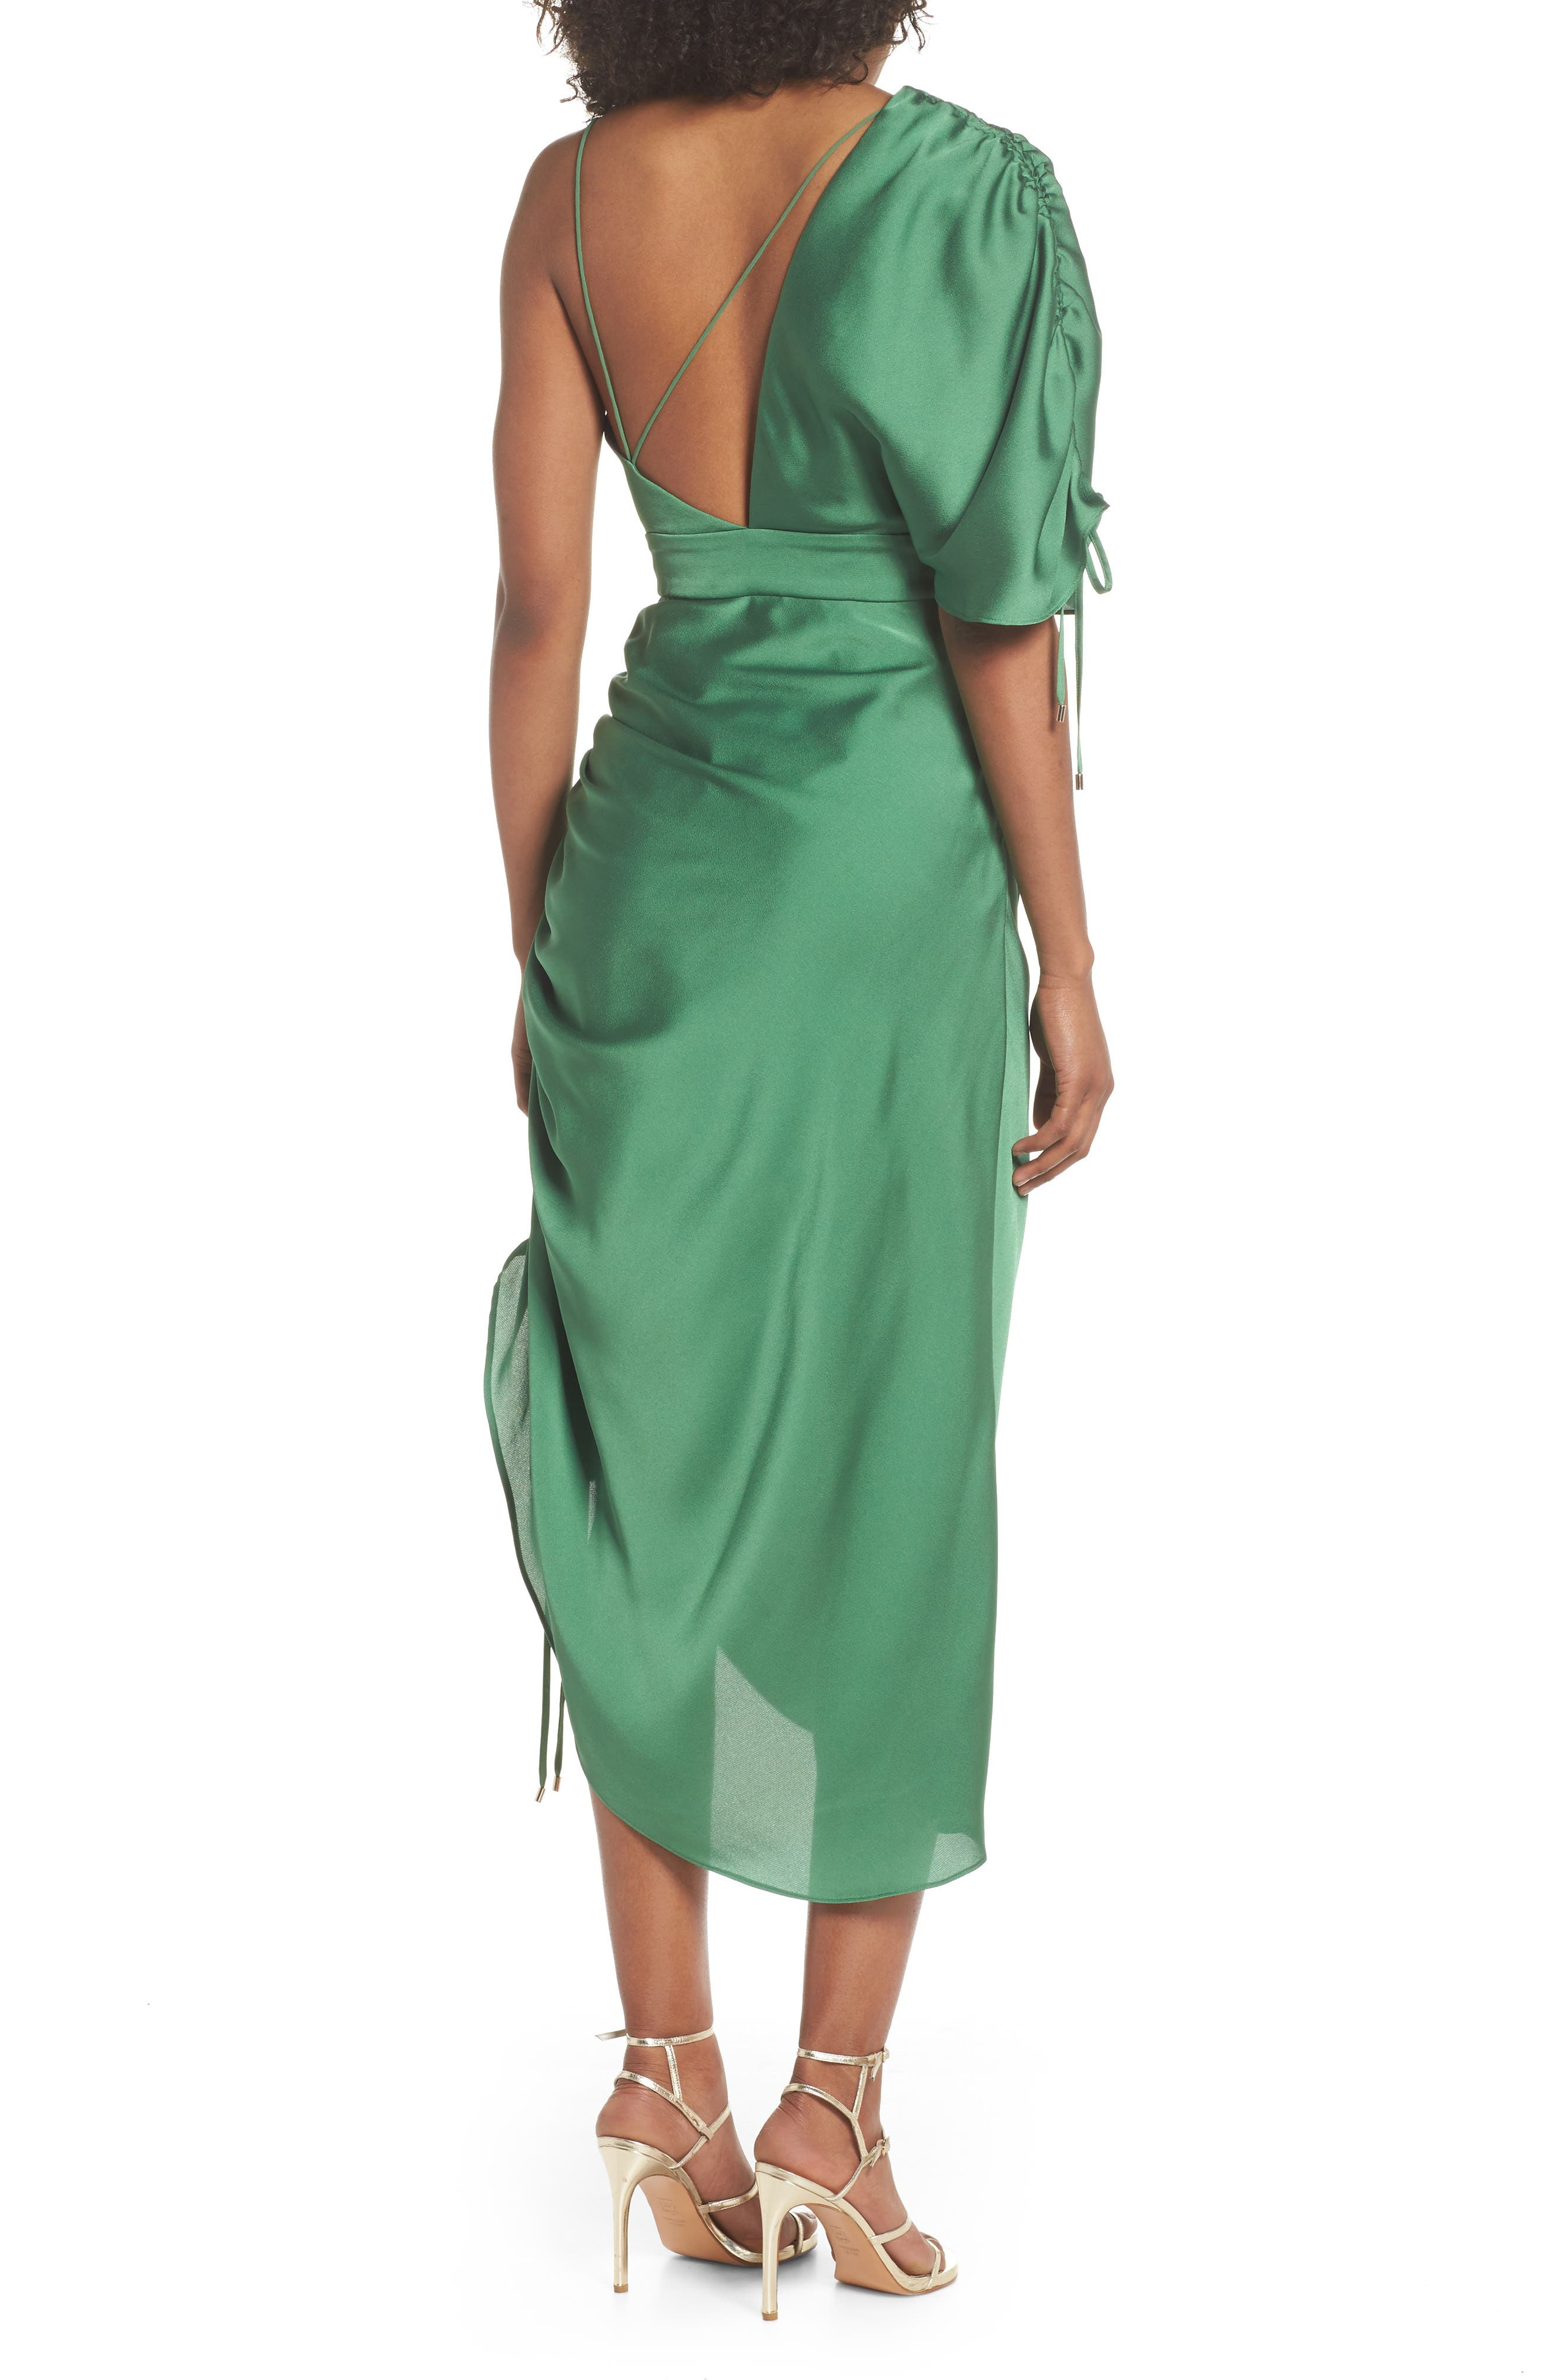 I've Got You Asymmetrical Satin Dress,                             Alternate thumbnail 2, color,                             Emerald Green